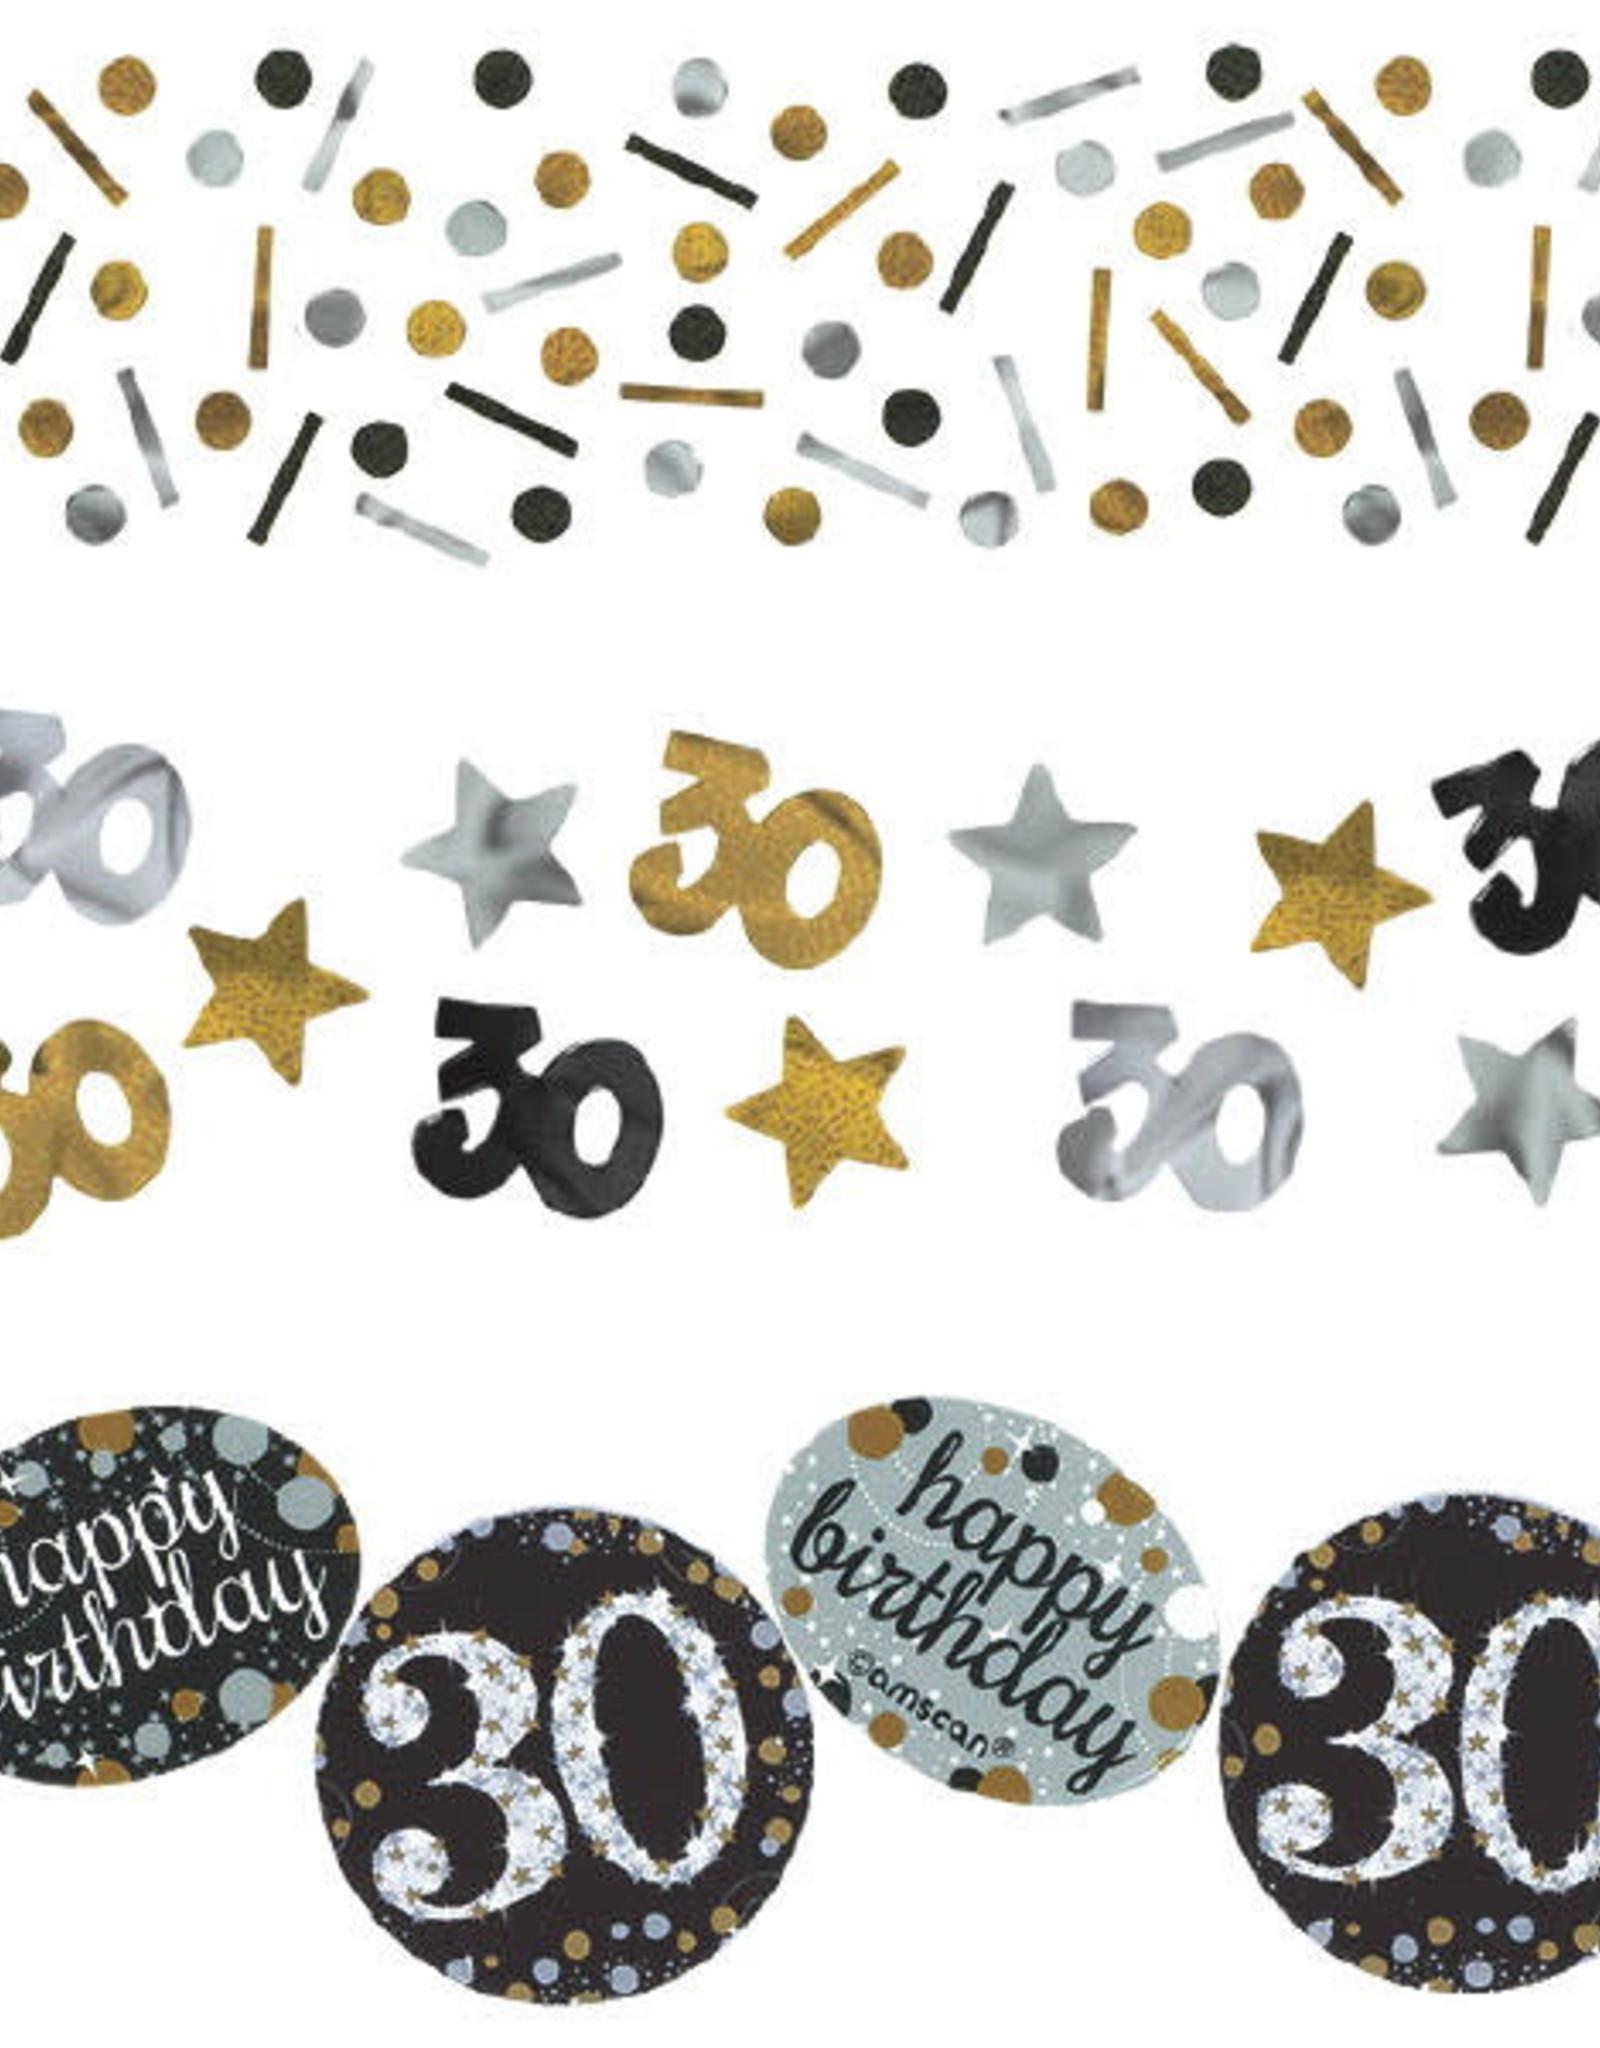 30th Birthday Black and Silver Confetti 1.2oz